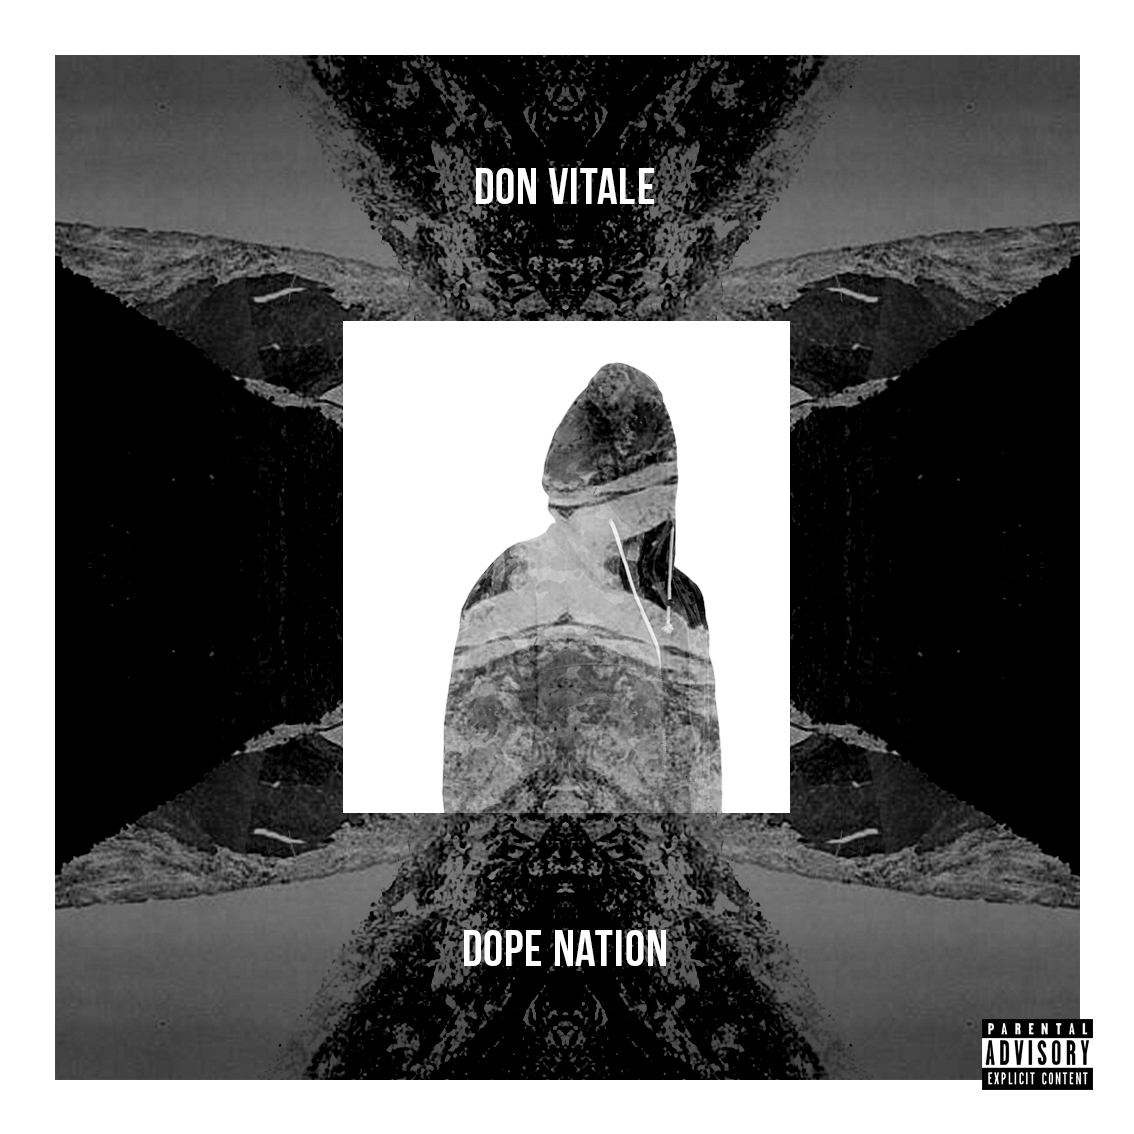 Don Vitale - Dope Nation